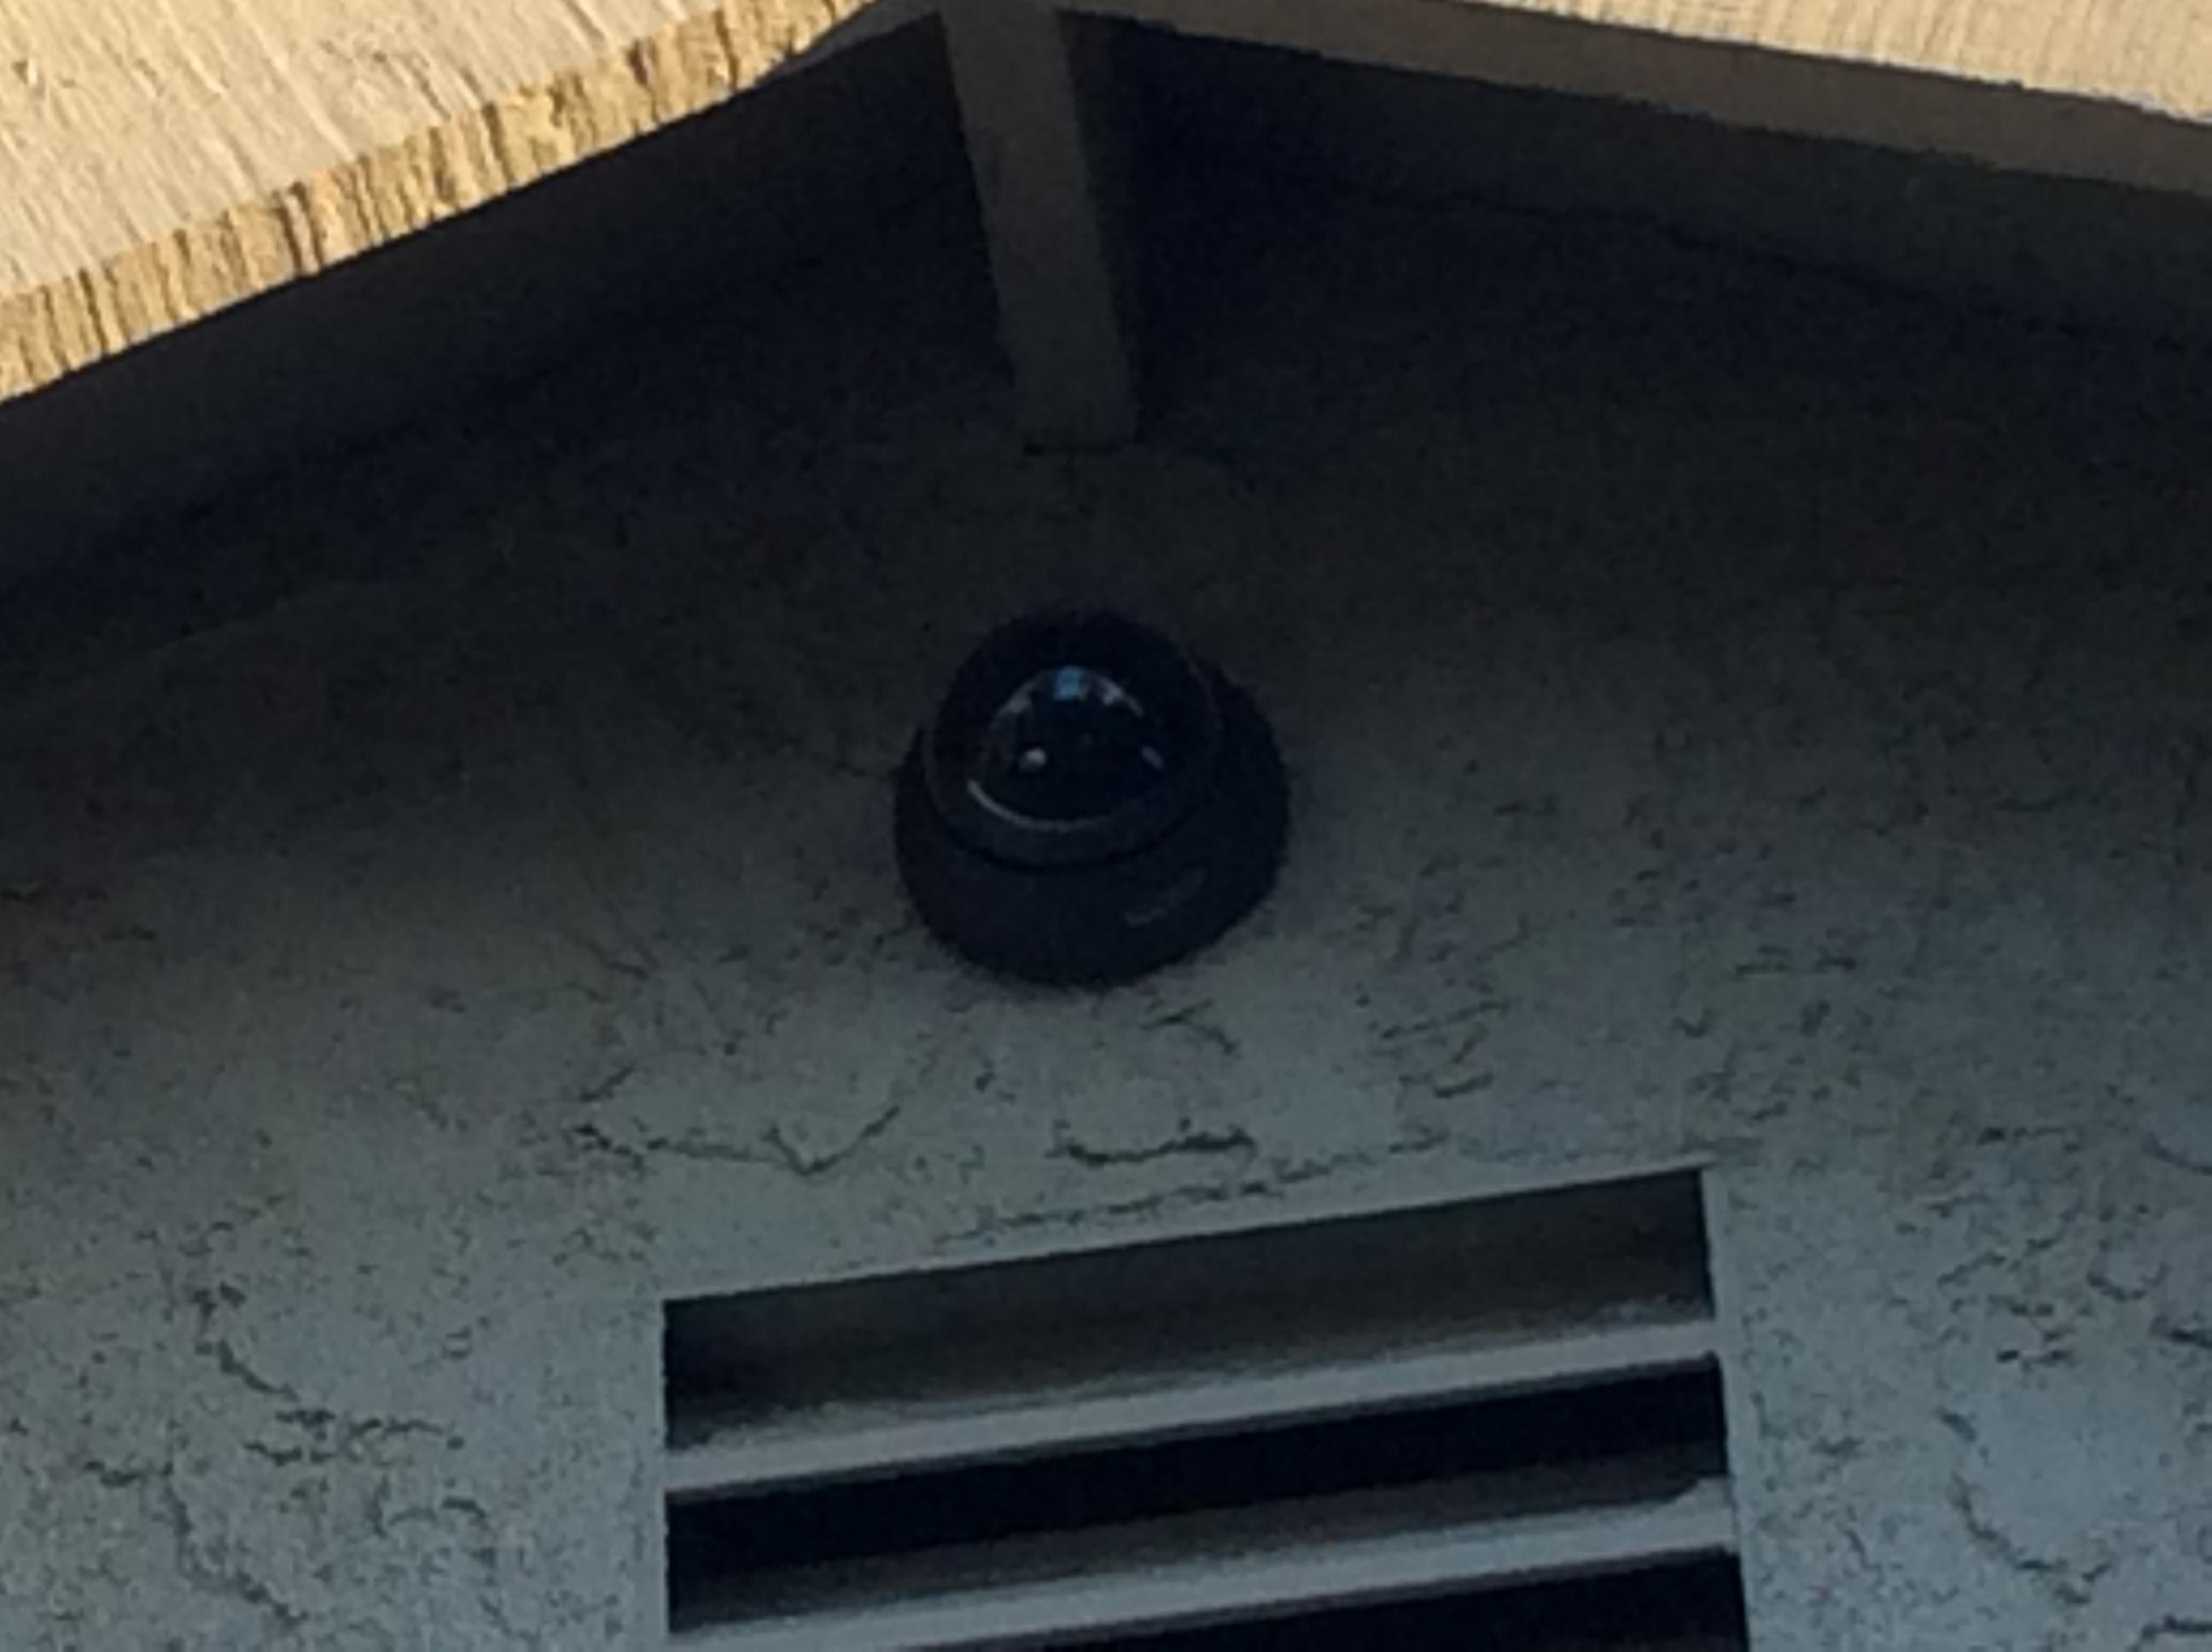 Pacific Video Sound Security Inc Thousand Oaks California Ca